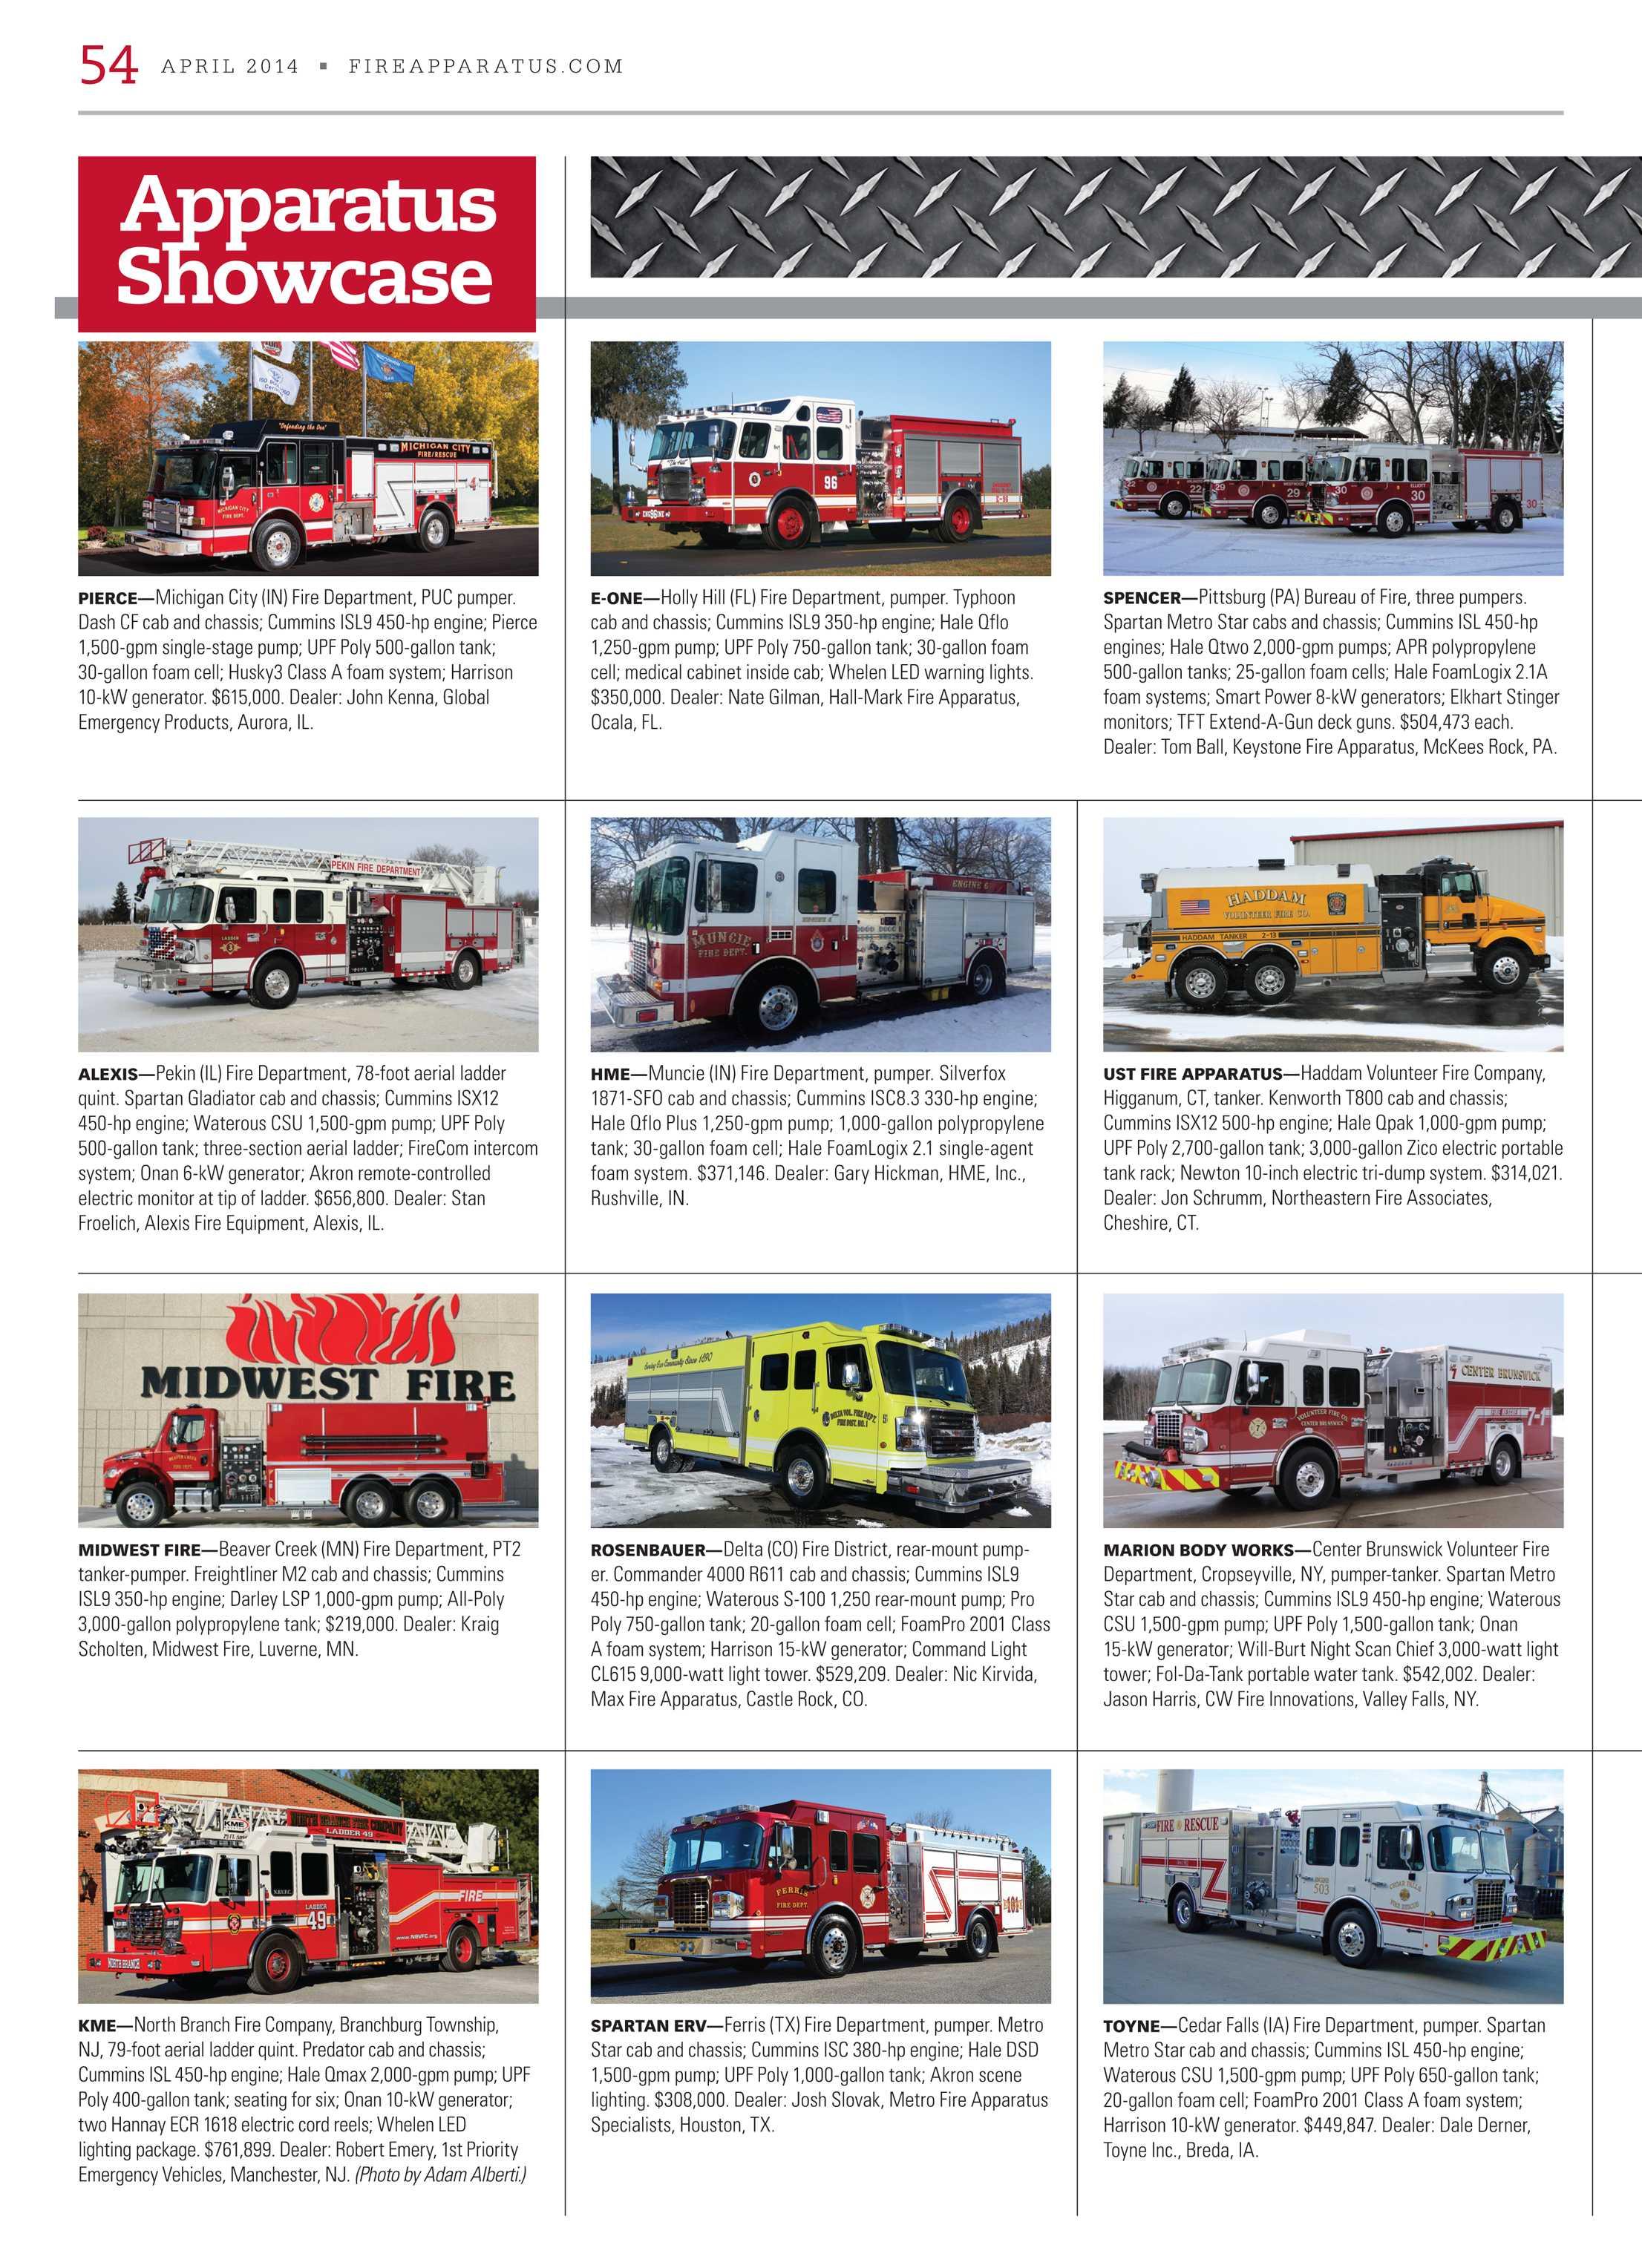 Fire Apparatus Magazine - April 2014 - page 54